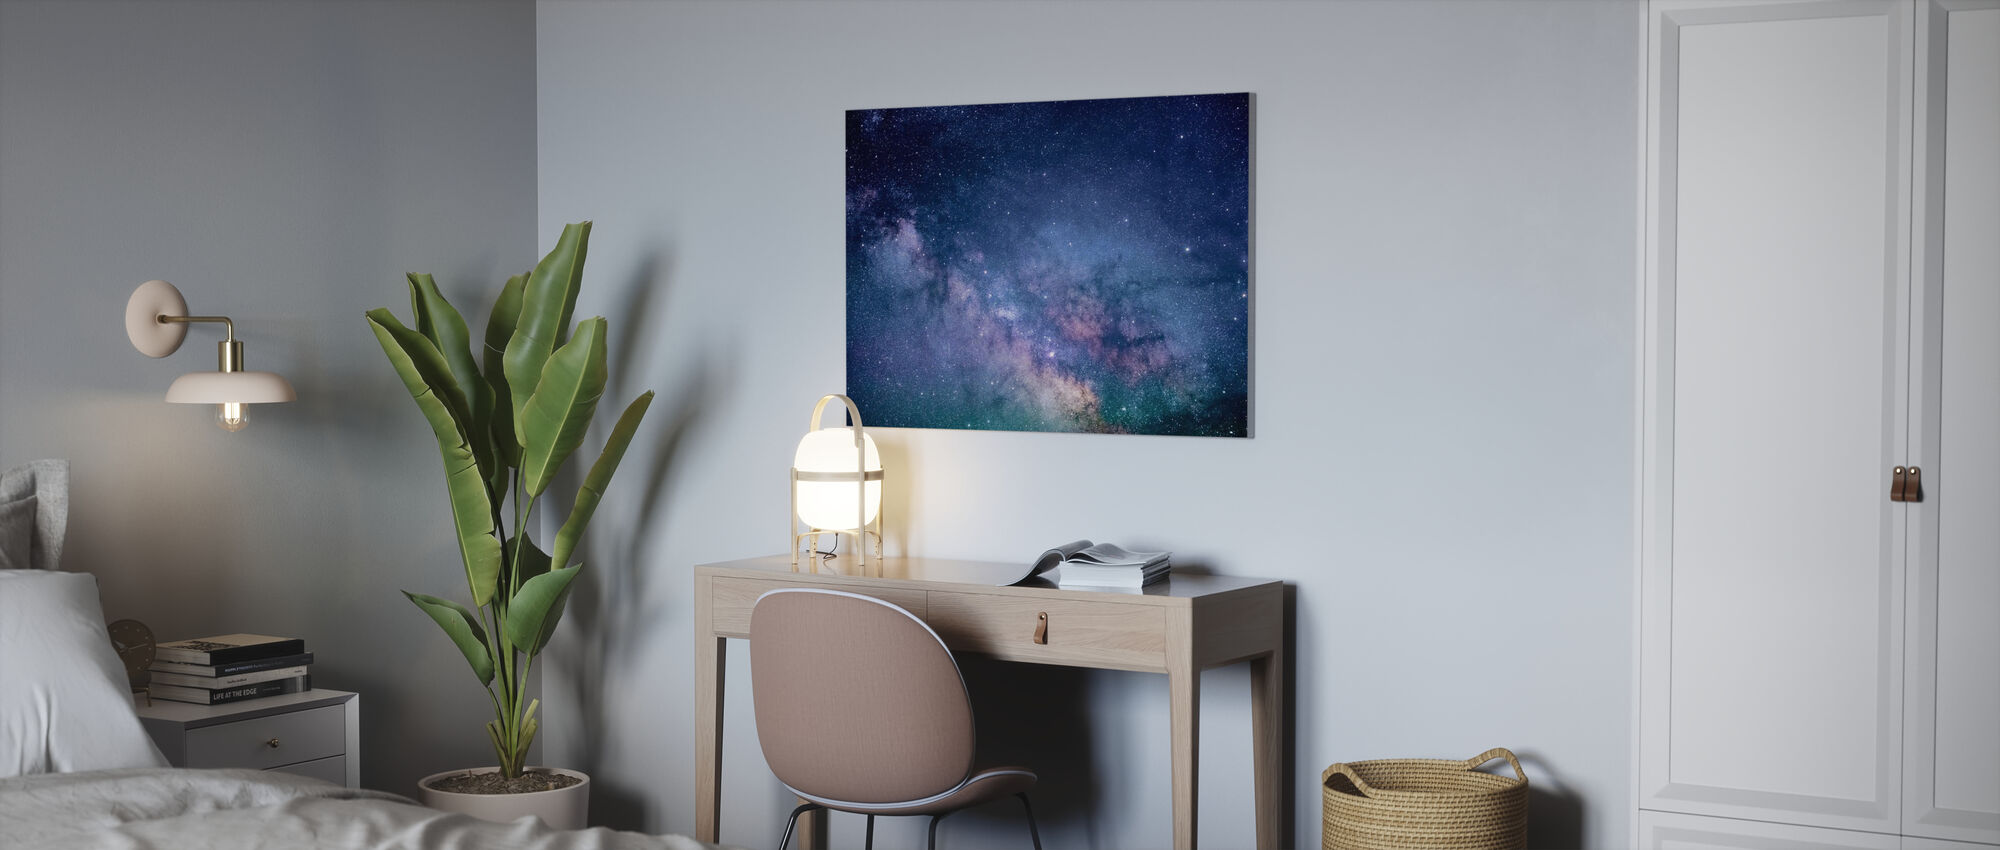 Galaxie Sterne - Leinwandbild - Büro